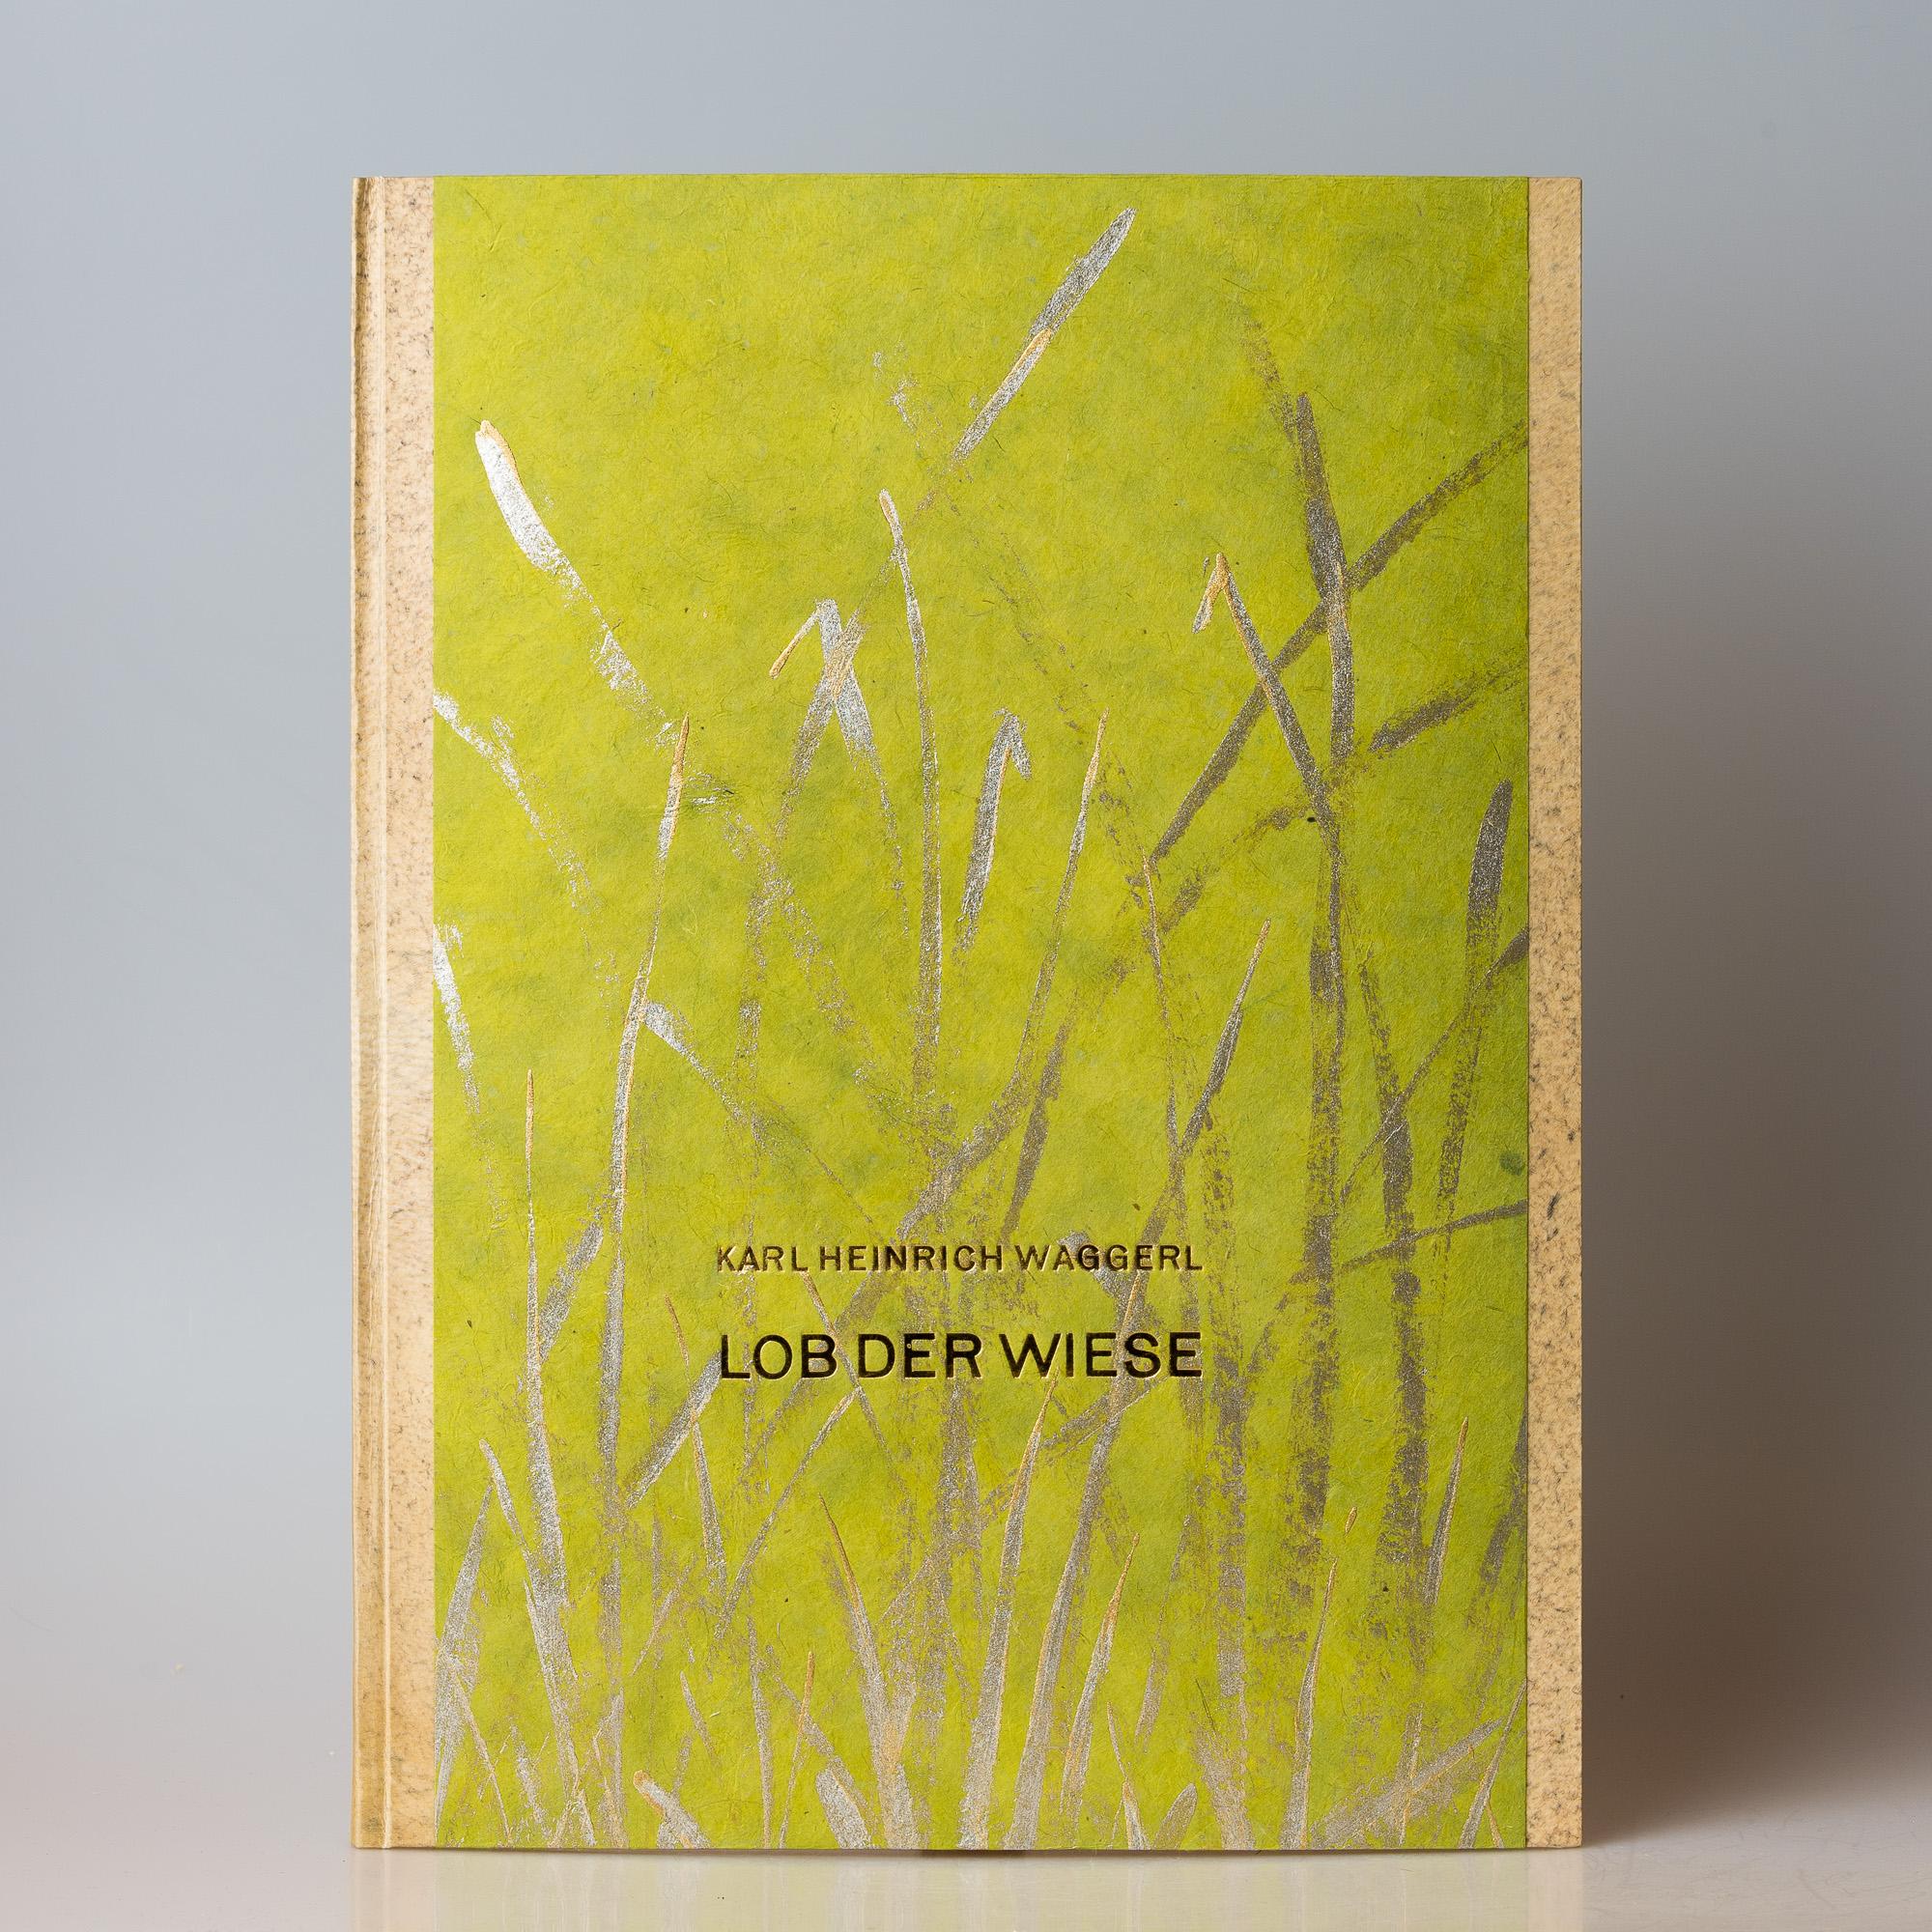 Lob der Wiese, Waggerl, Halbpergamentband  500.-